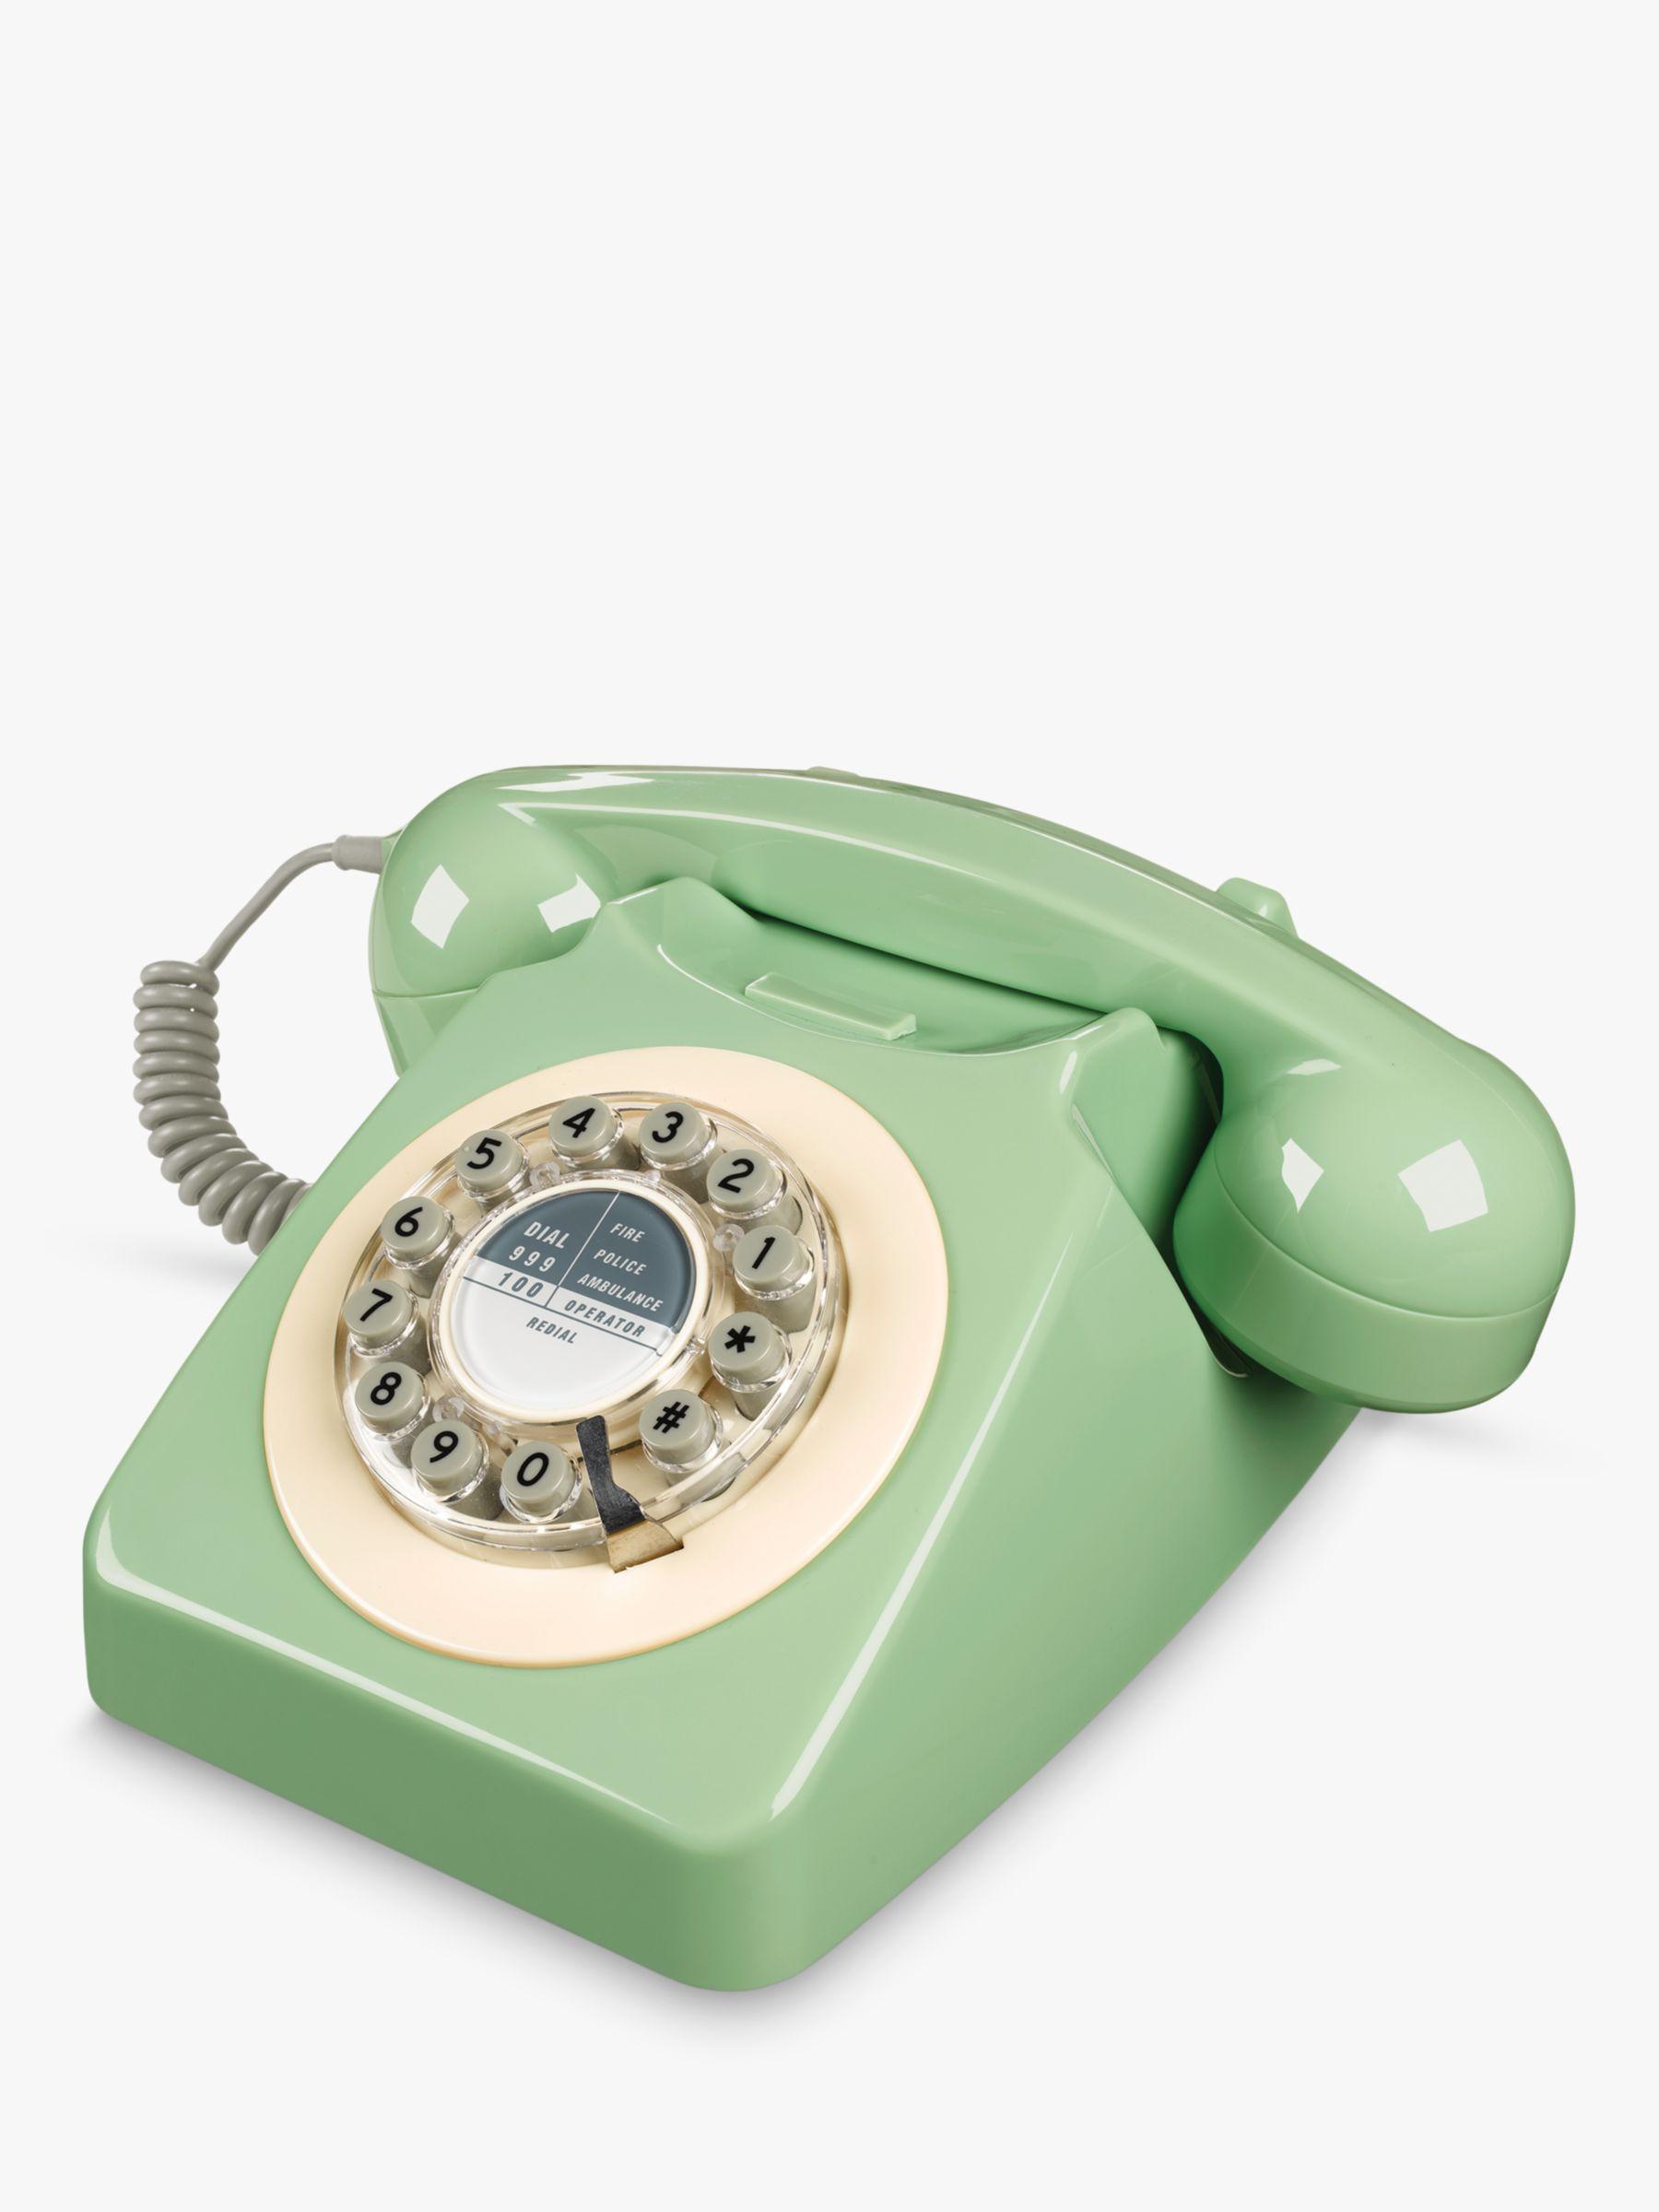 Wild & Wolf Wild & Wolf 746 1960s Corded Telephone